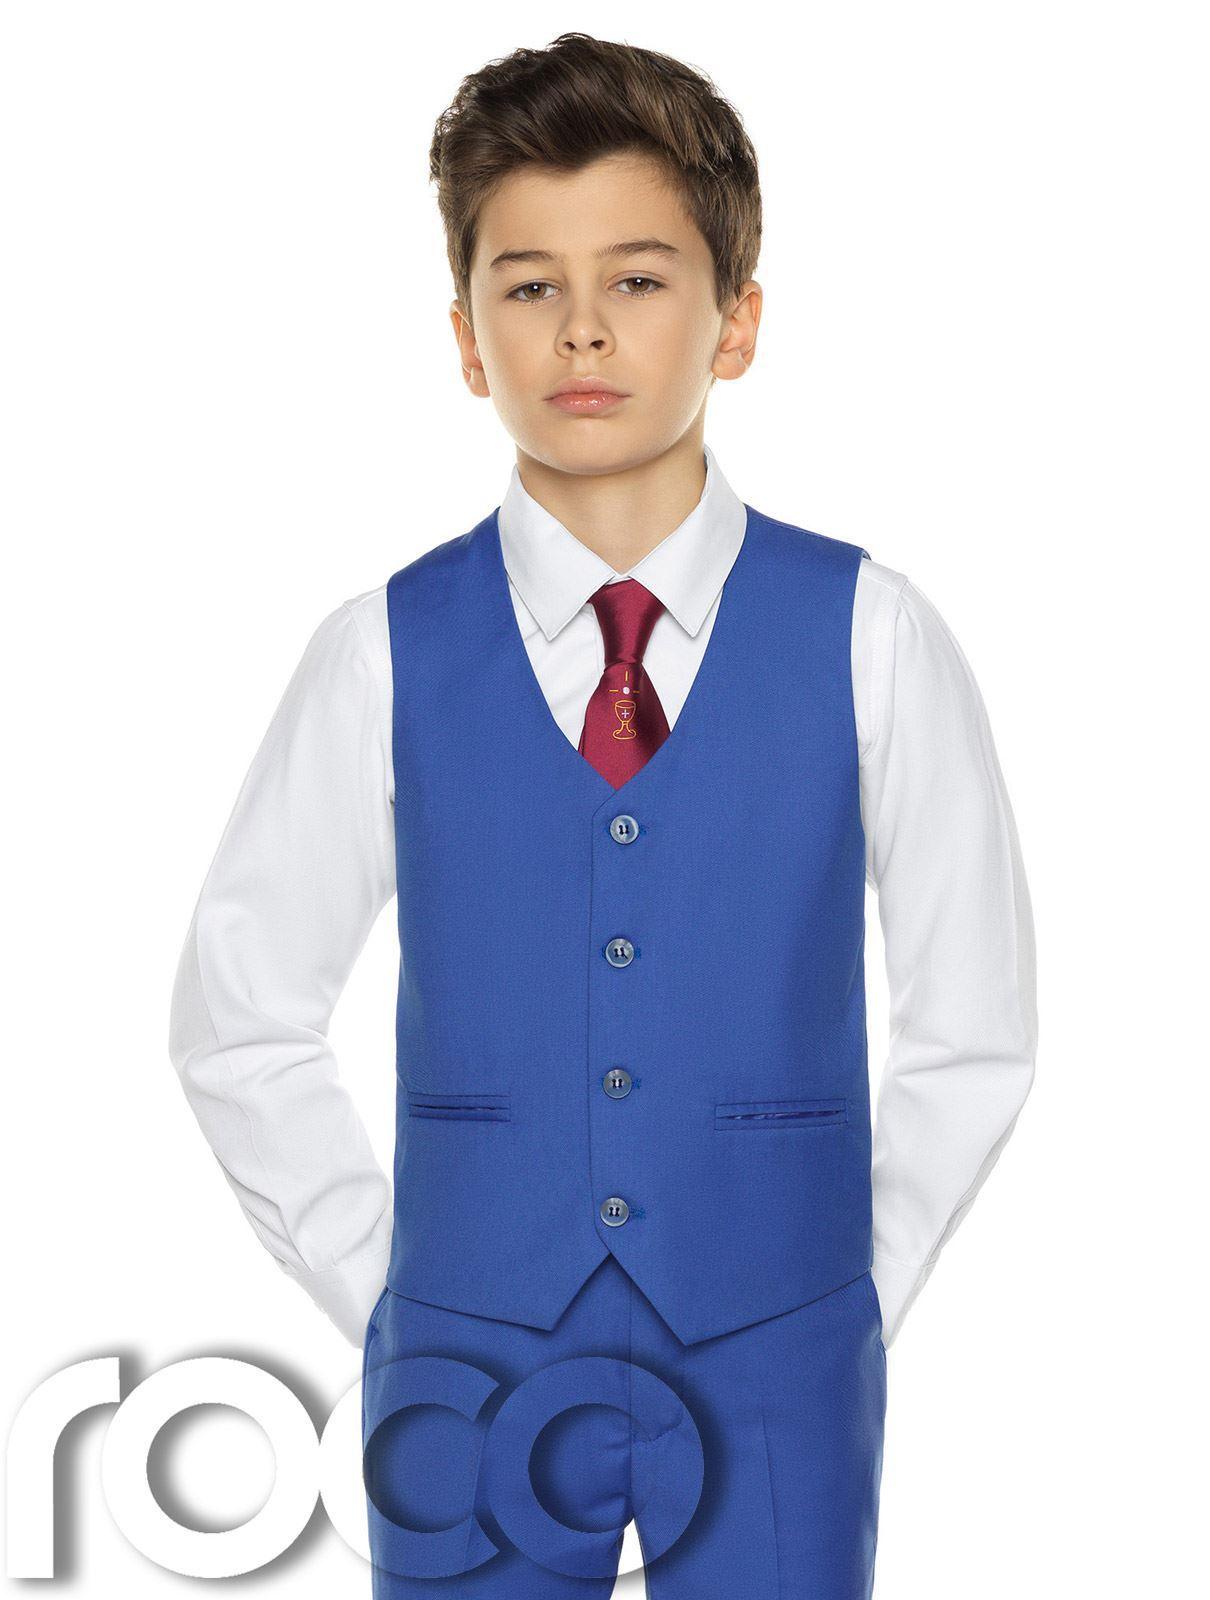 Garcons-Costume-Bleu-Communion-Costume-Bleu-Communion-Costume miniature 12